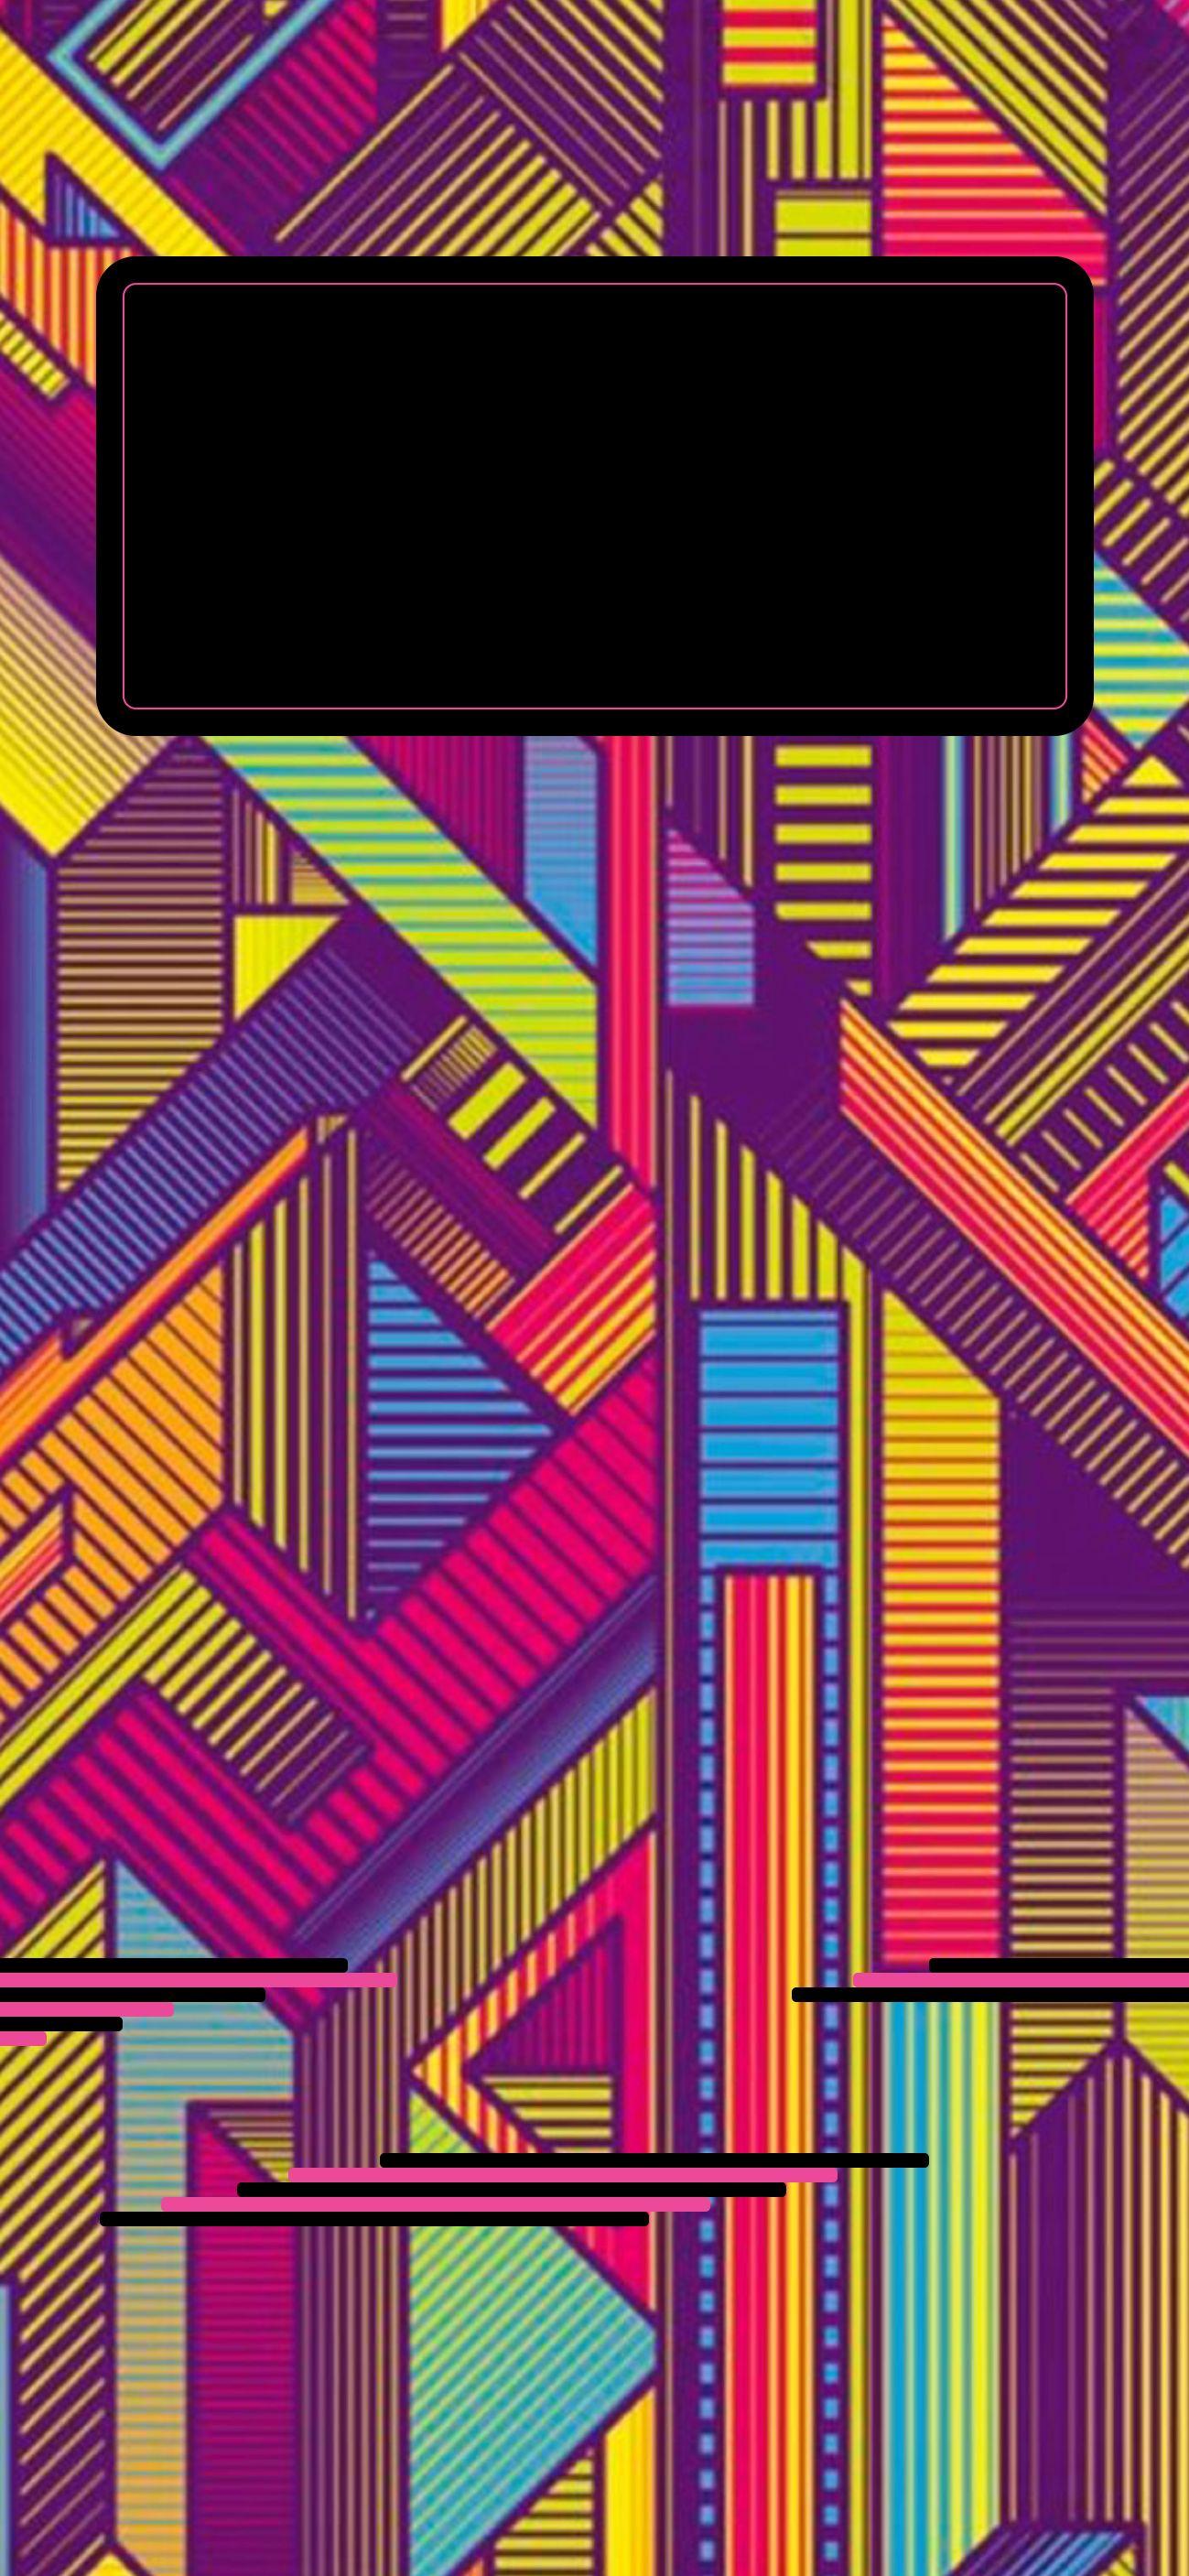 iPhone X wallpapers image by Robbskittles Robbskittles